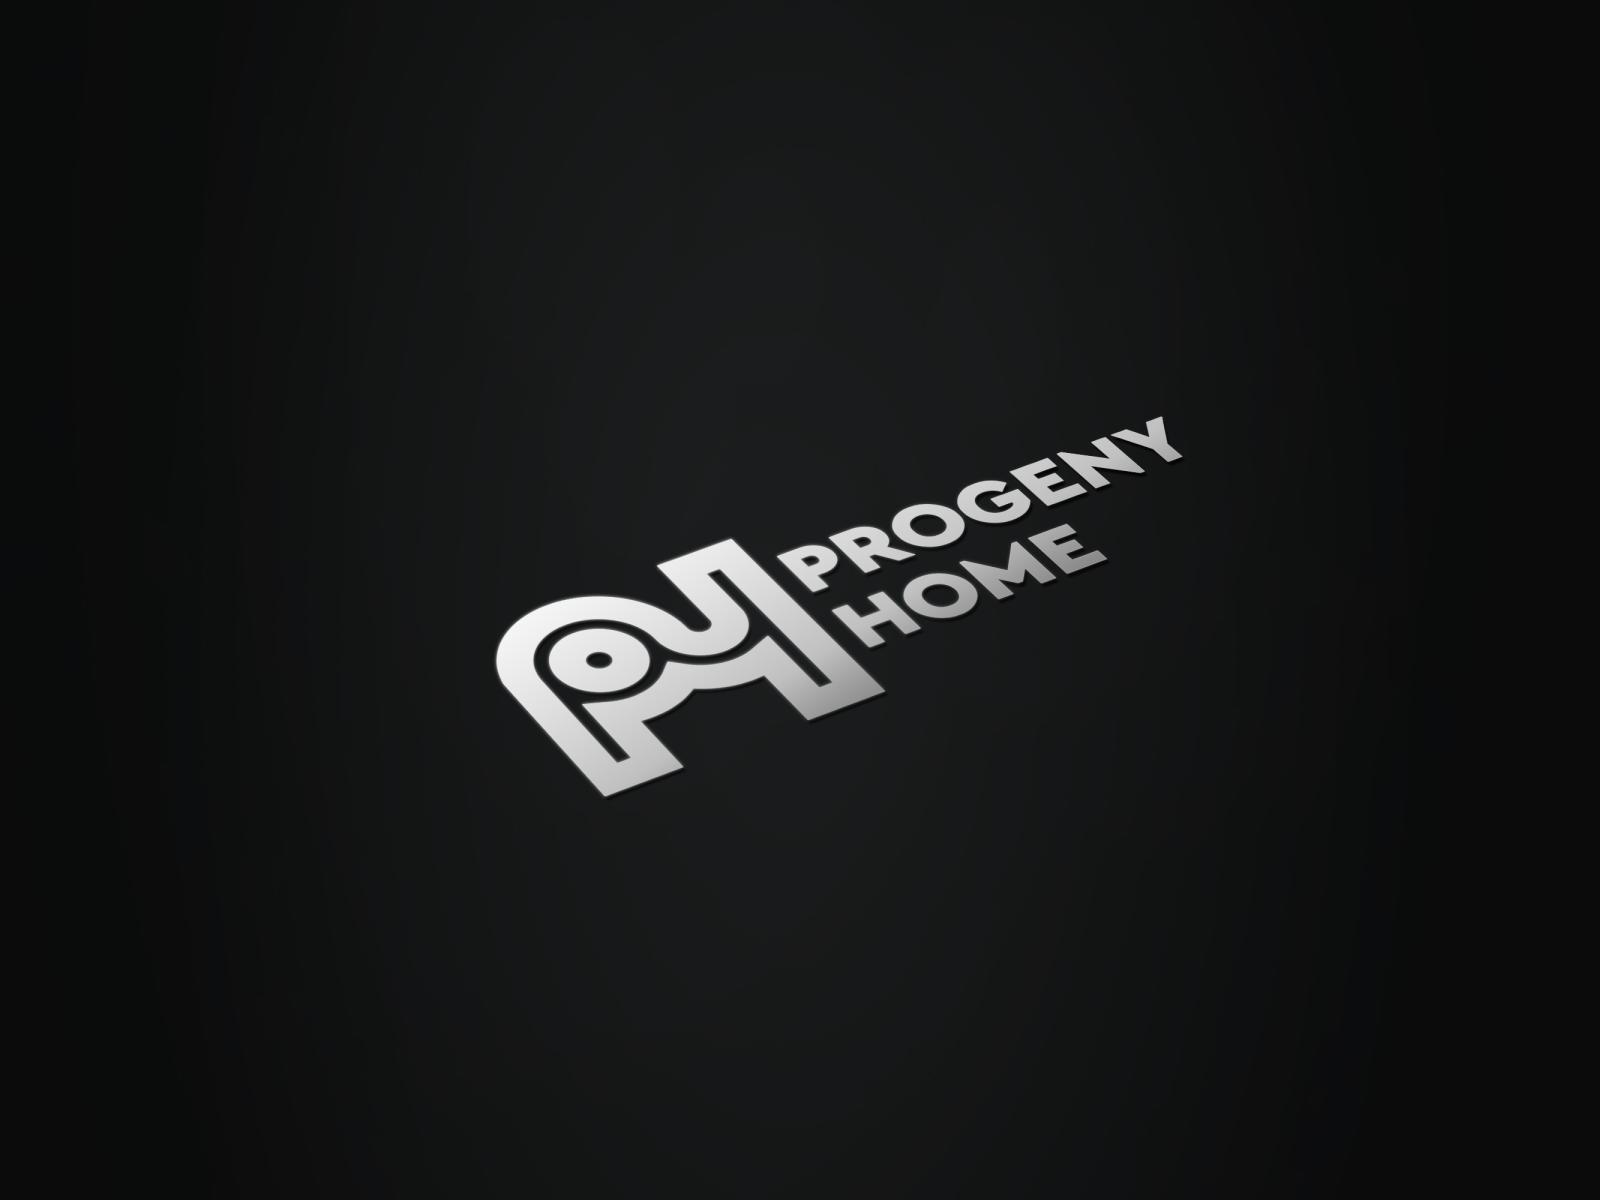 Monogram P H Progeny Home By Fauzi Mutaqin On Dribbble